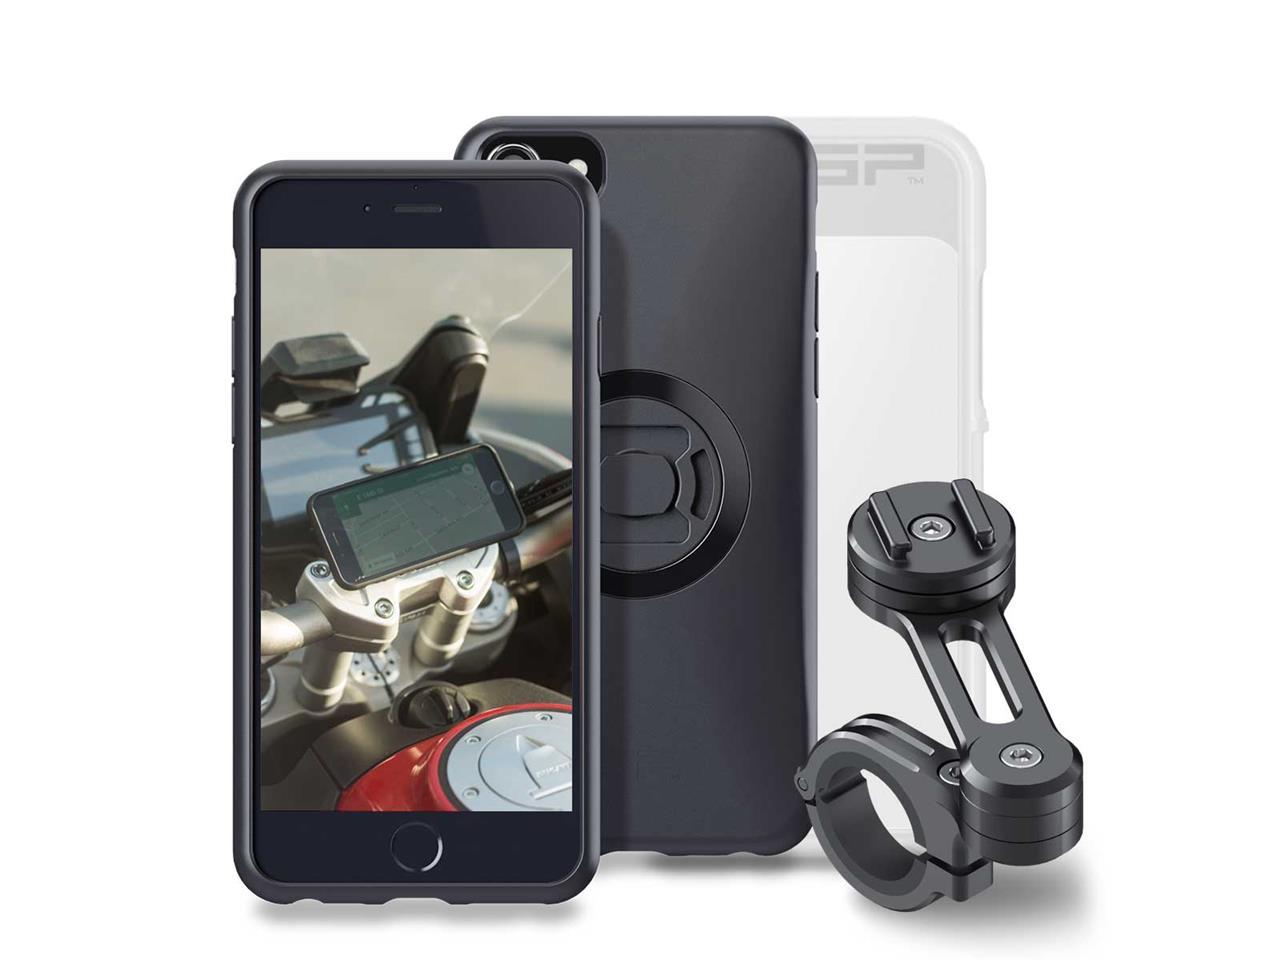 Support smartphone SP-Connect Moto Bundle iPhone 8/7/6s/6. Support smartphone SP-Connect Moto Bundle iPhone 8/7/6s/6